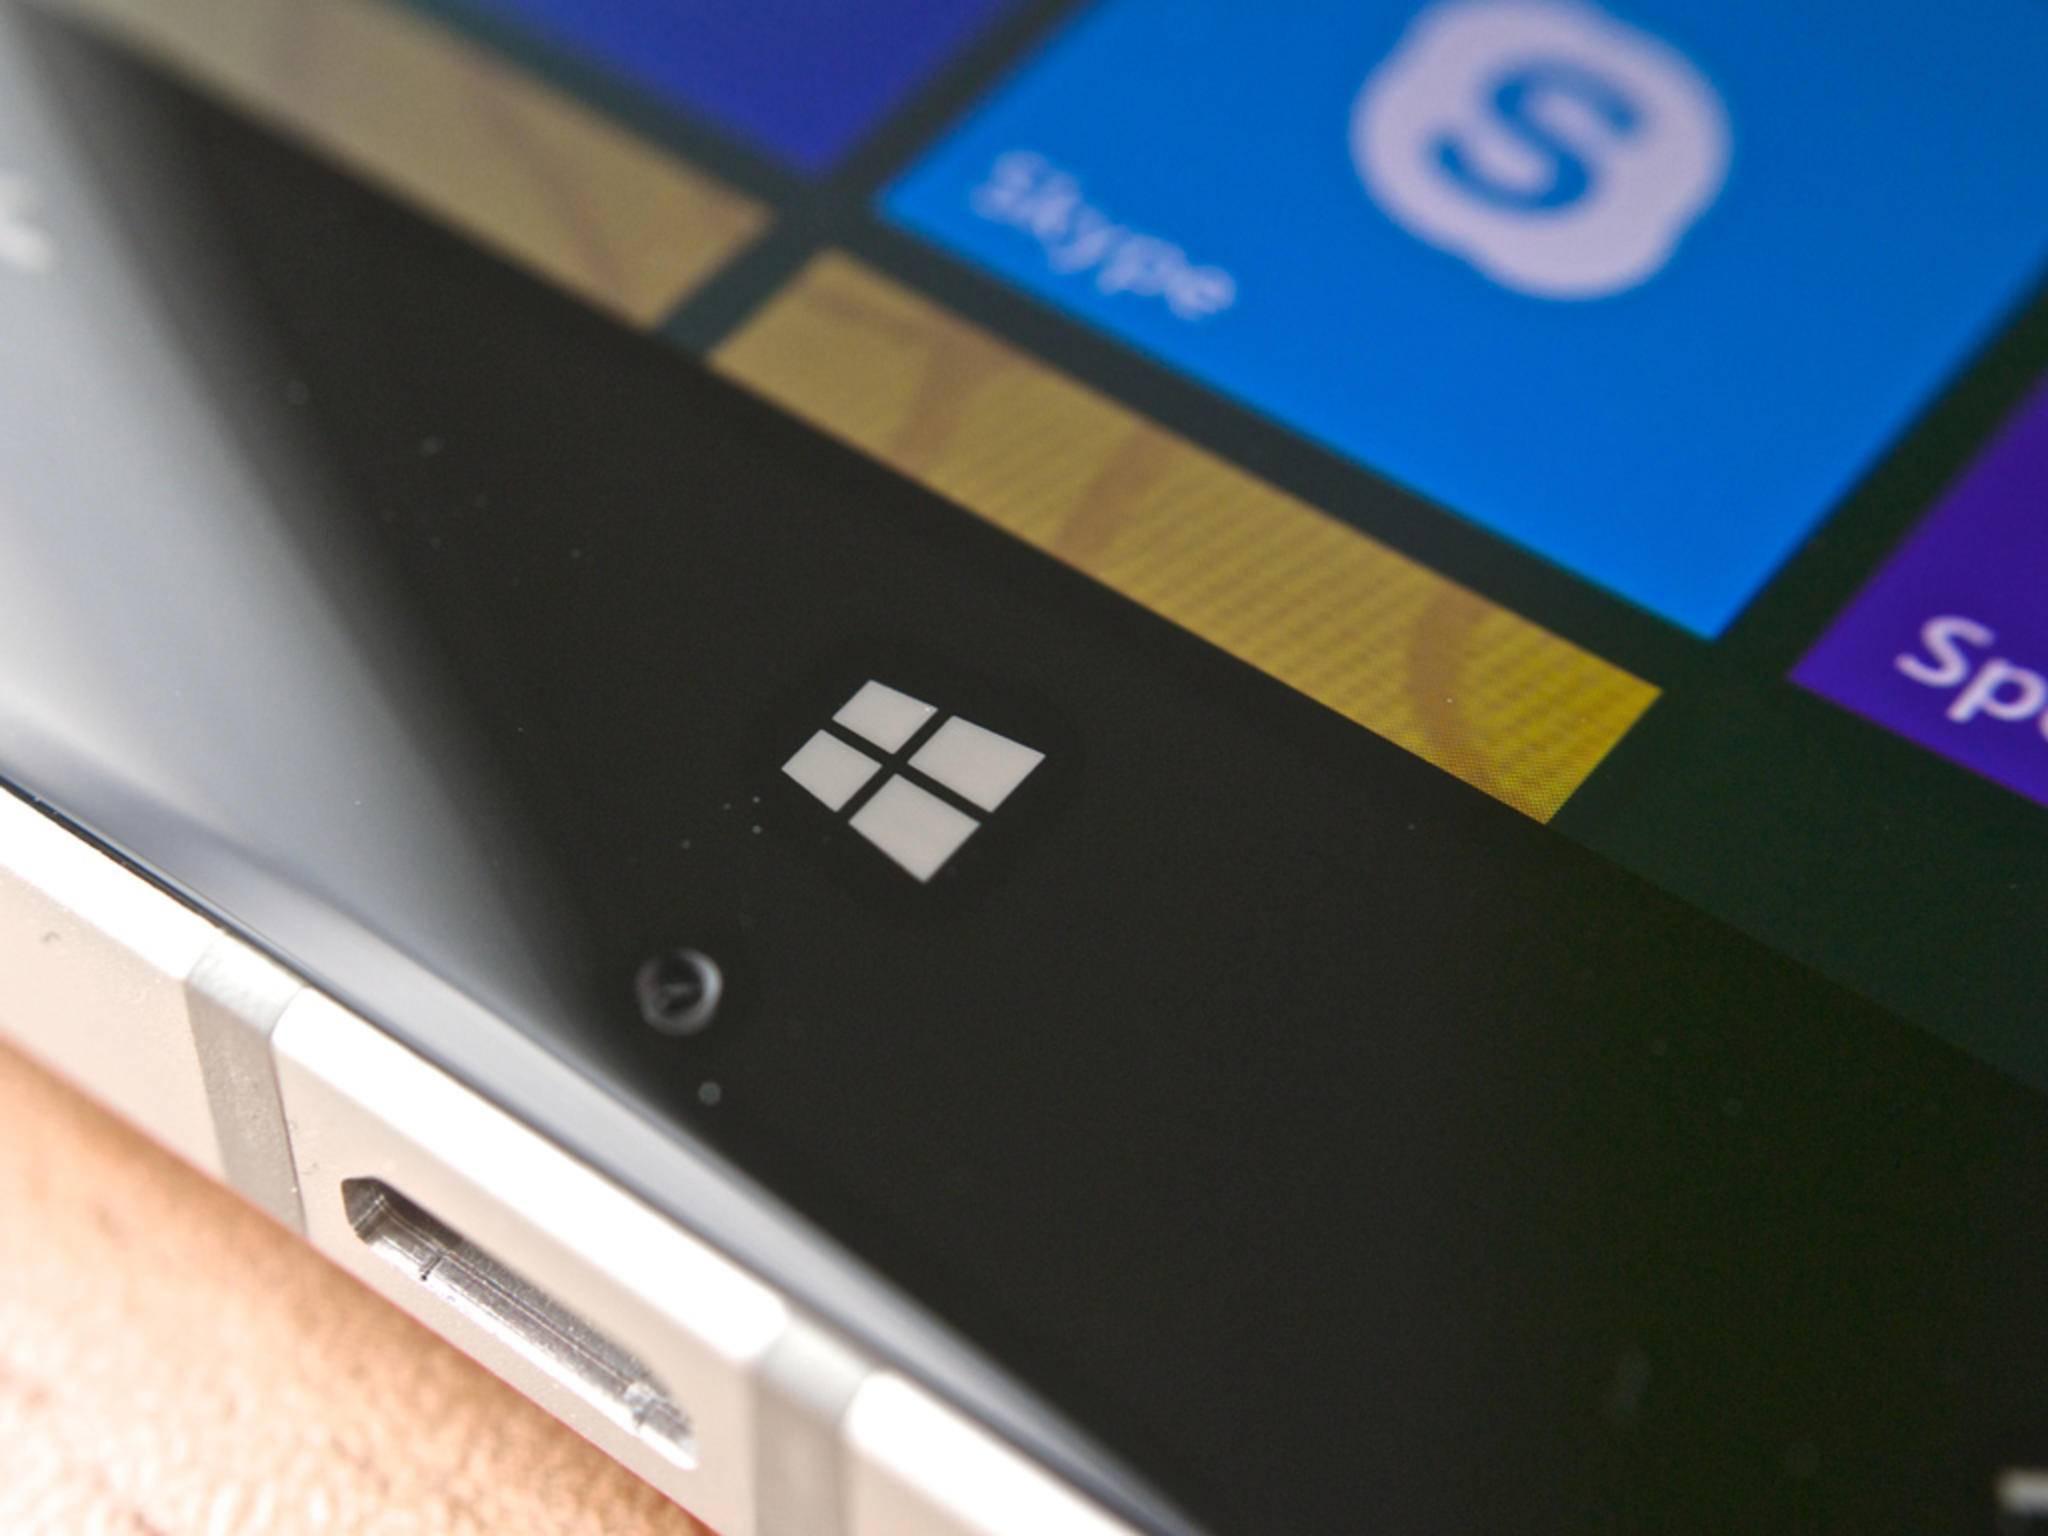 Am 6. Oktober enthüllt Microsoft wohl das Lumia 950.